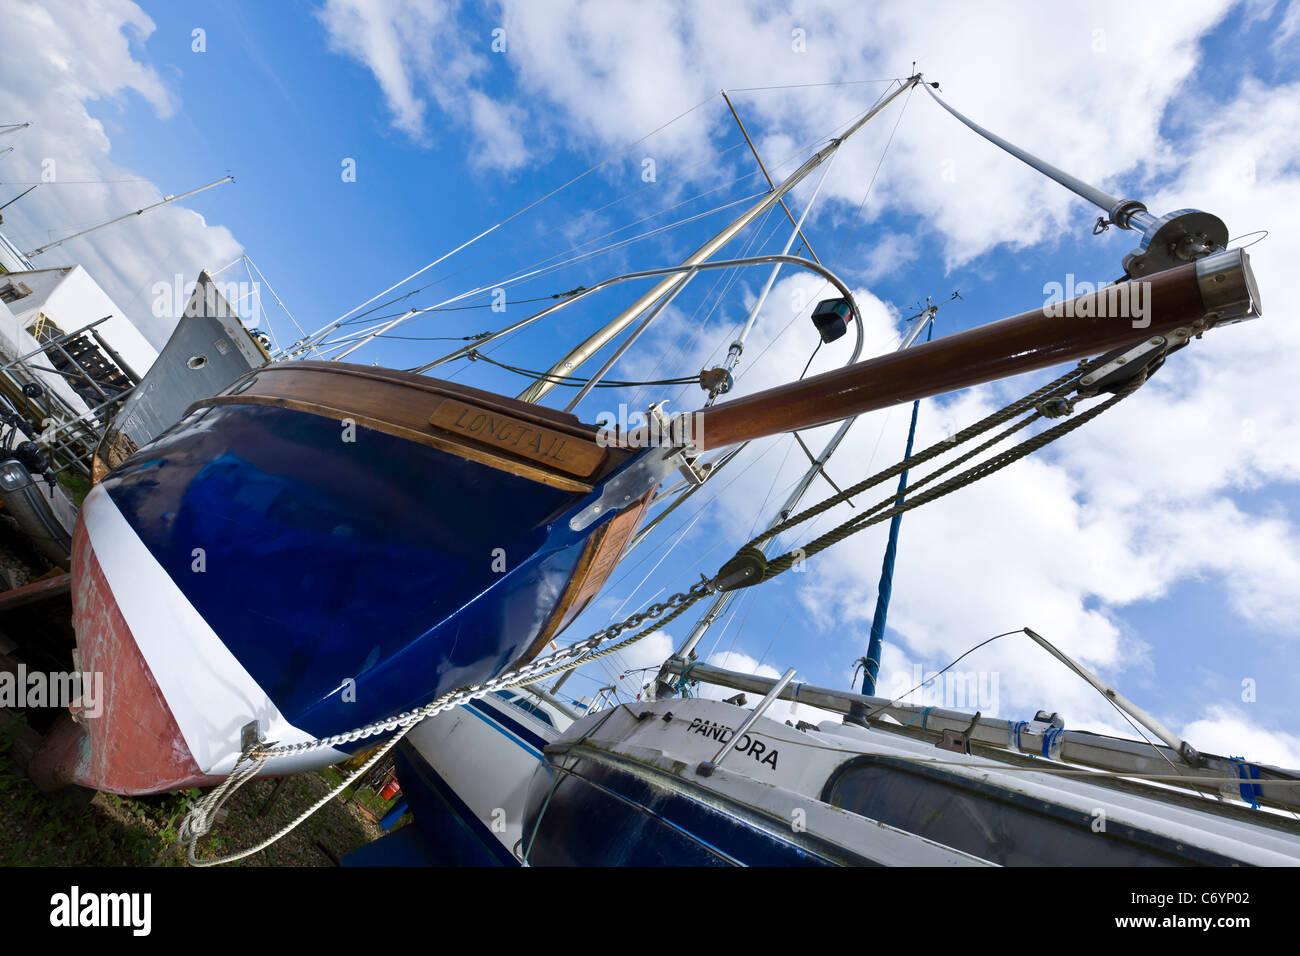 The Boatyard - Stock Image